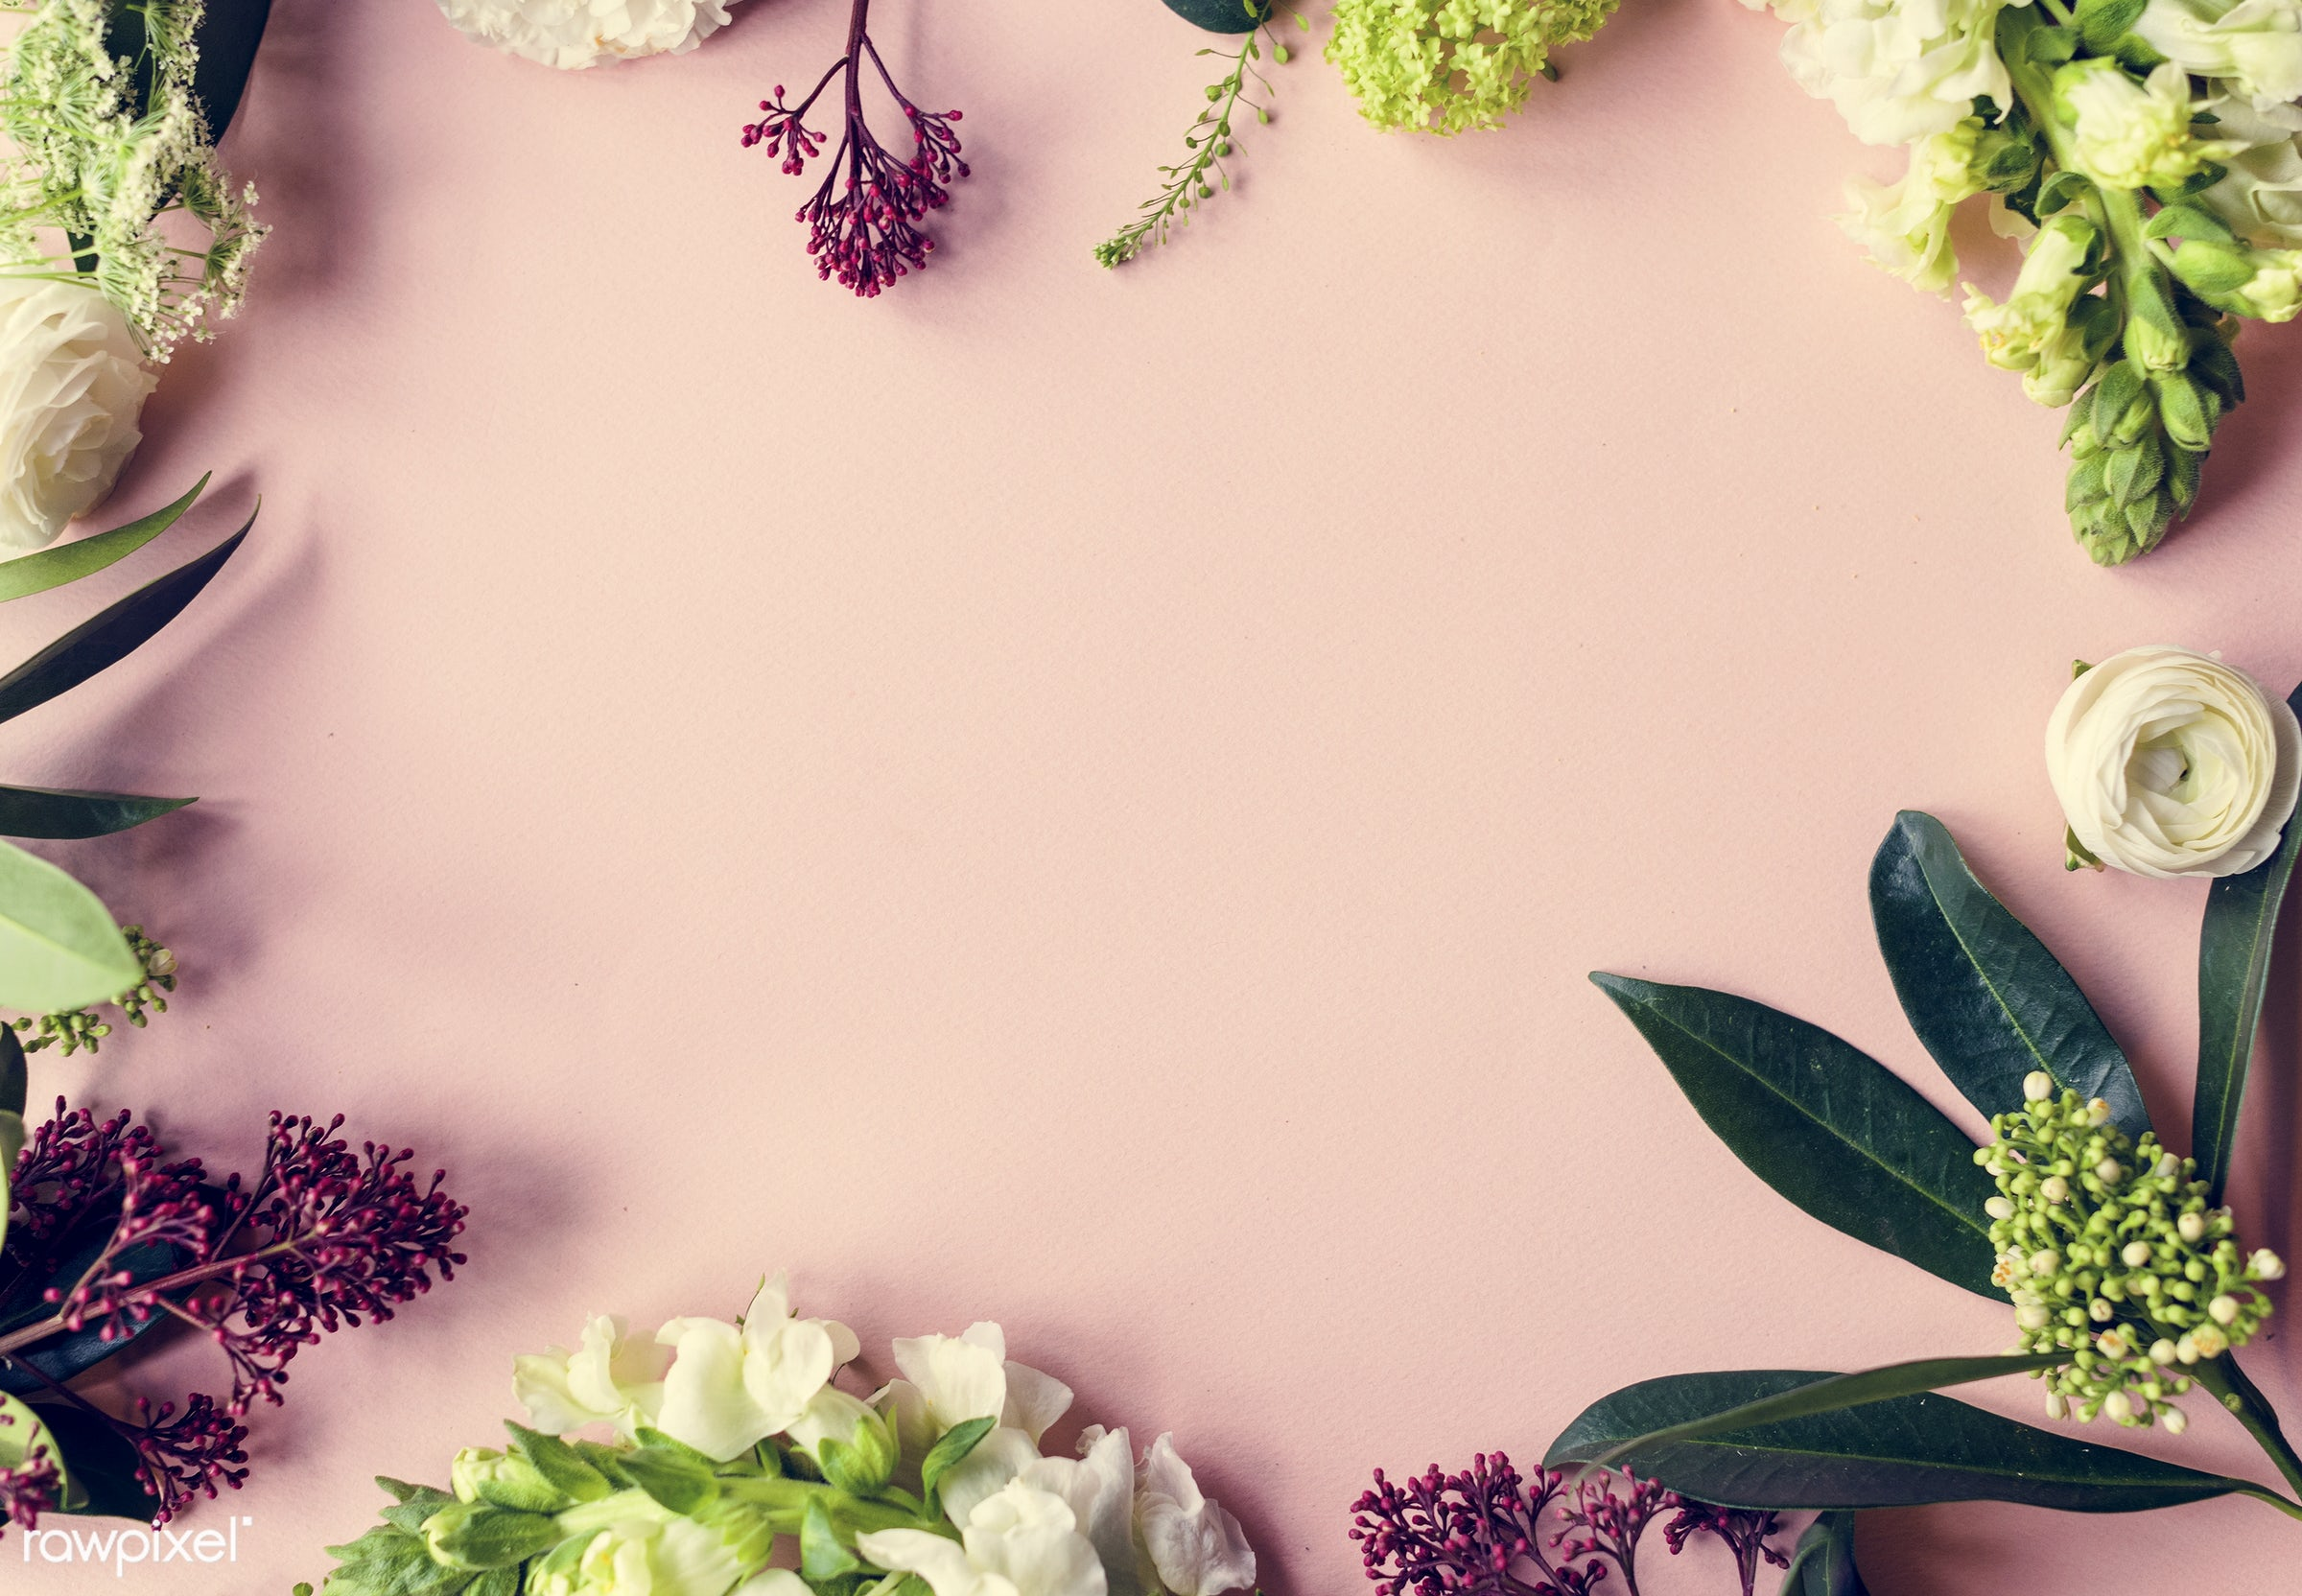 nobody, bouquet, detail, copy space, decorative, plants, show, tulips, space, decor, nature, fresh, attractive, empty,...